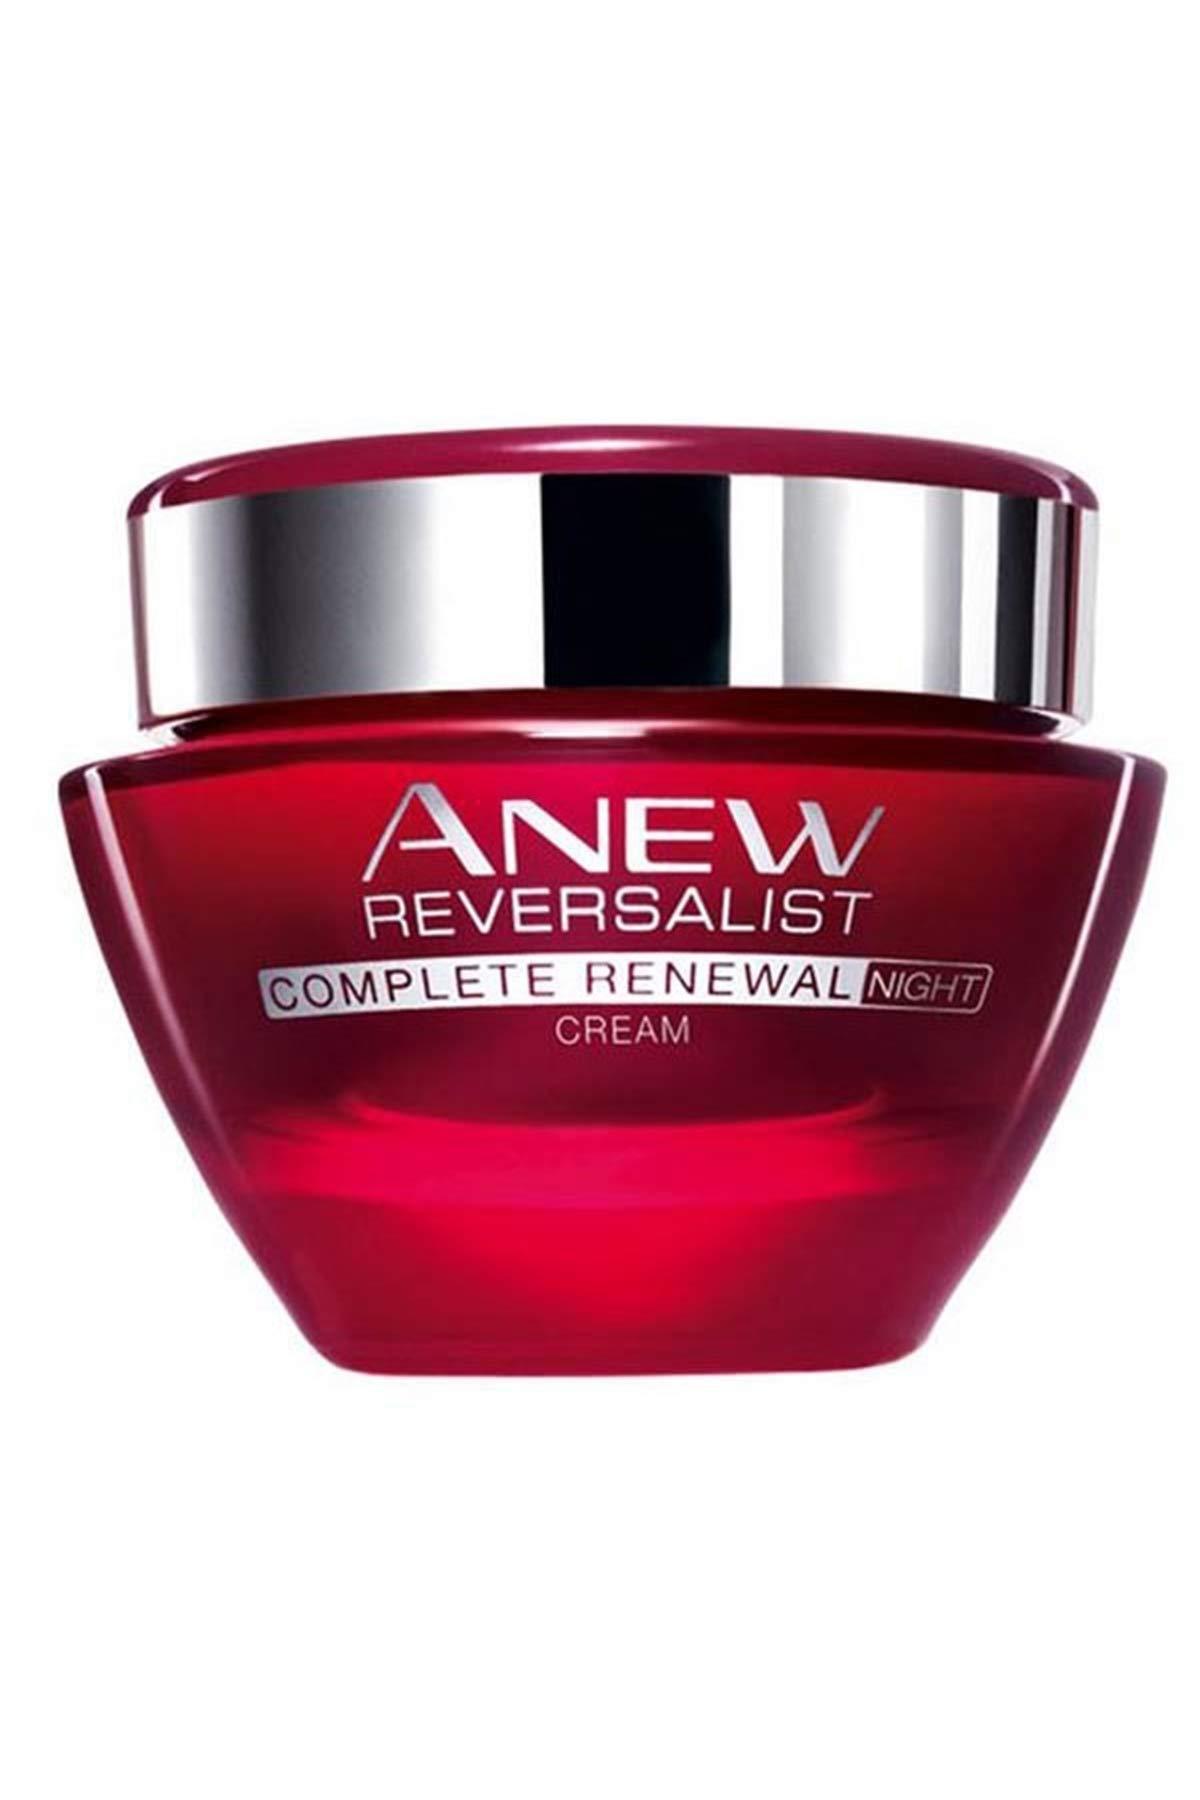 AVON Anew Reversalist Complete Renewal Night Cream 50ml-1.7oz